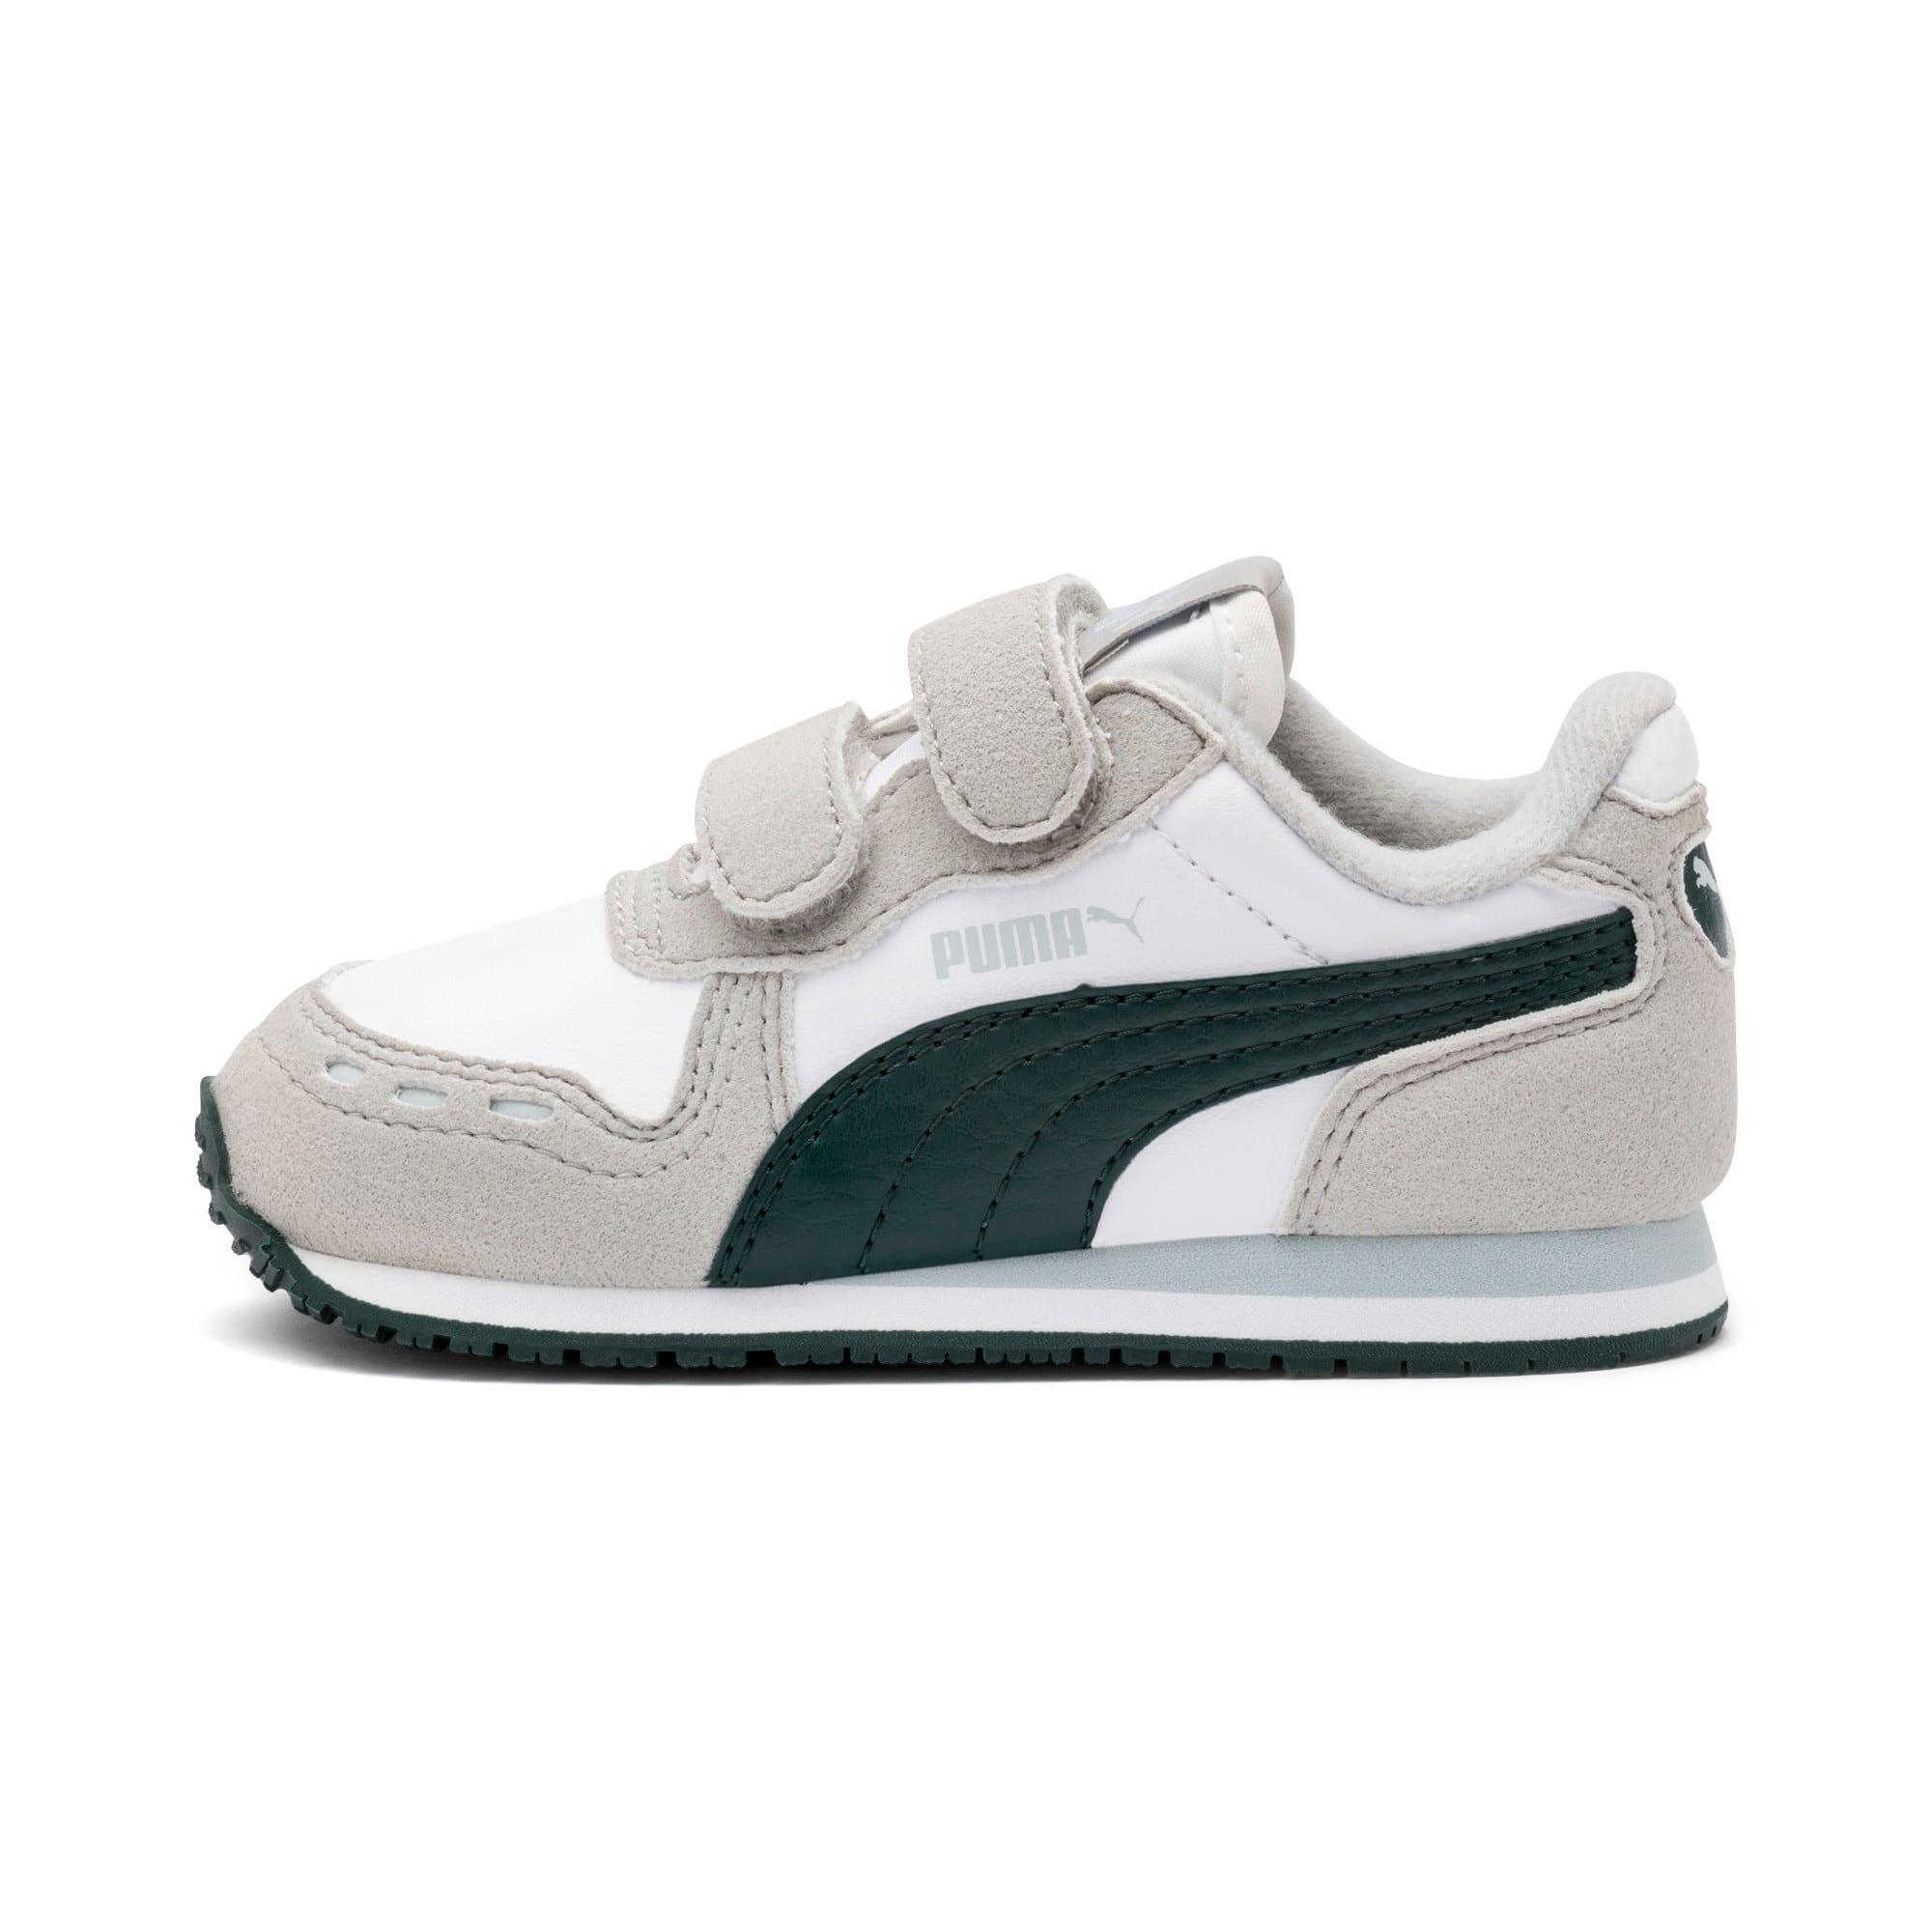 Thumbnail 1 of Cabana Racer SL Toddler Shoes, Puma White-Gray Violet, medium